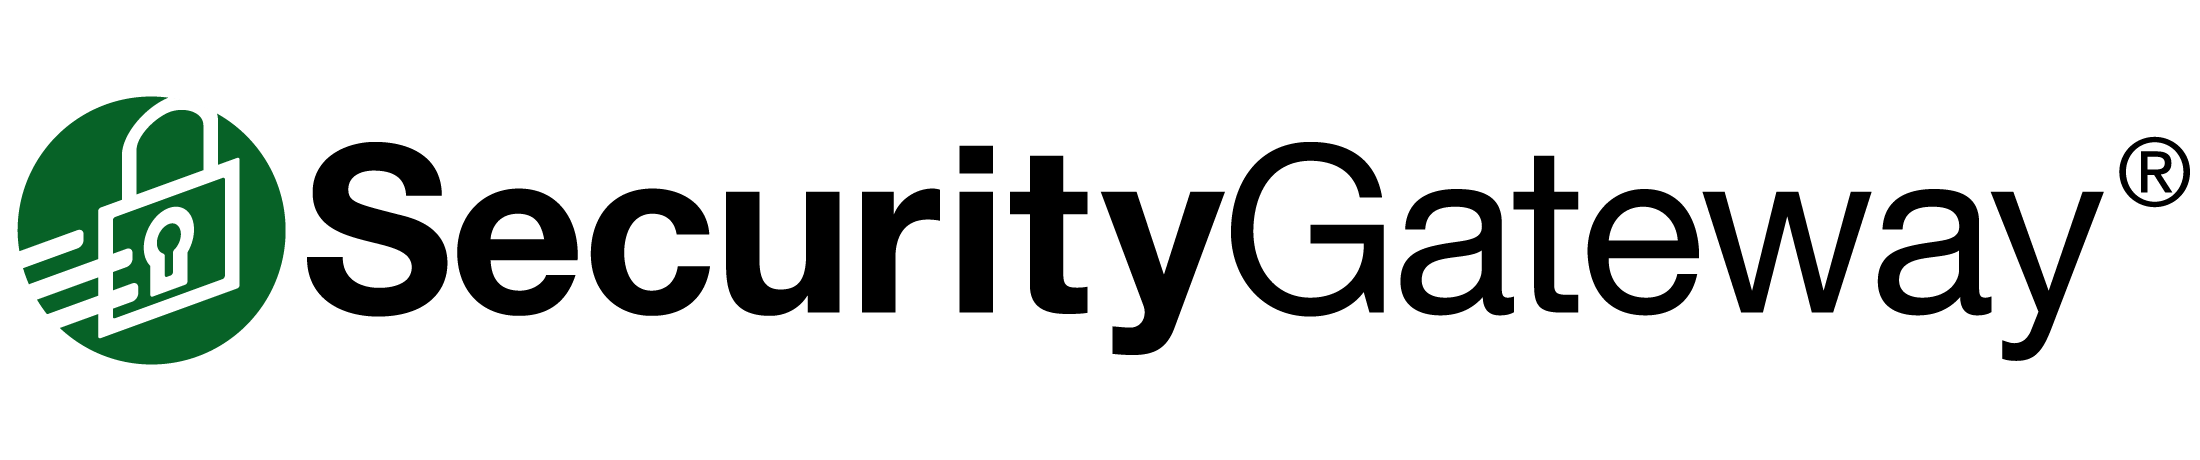 SecurityGateway logo